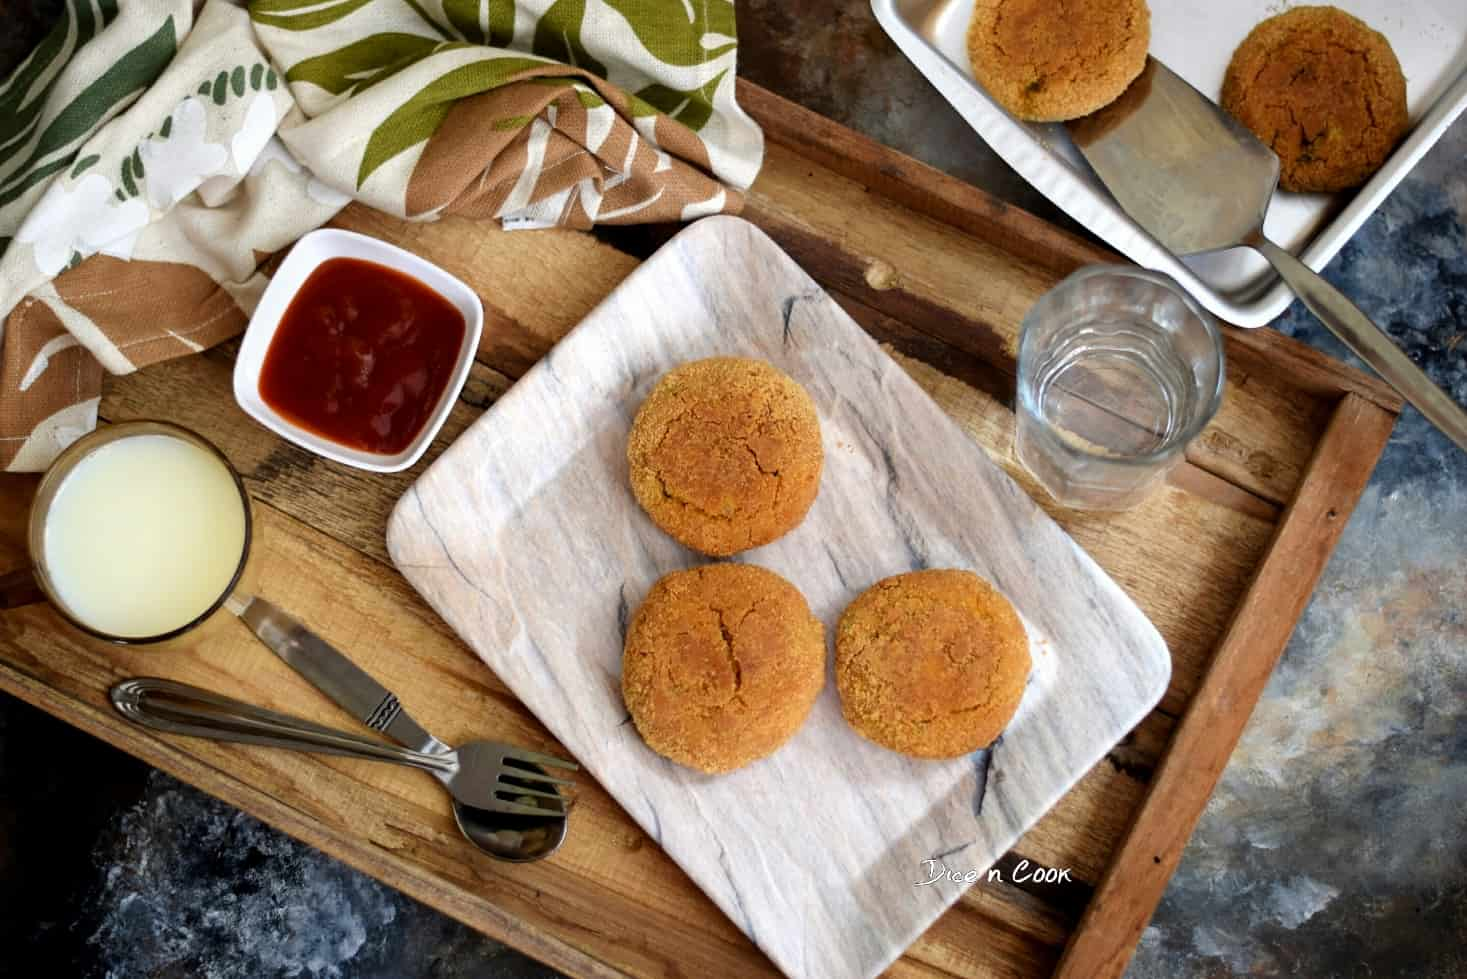 Baked-Stuffed-Sweet-Potato-Patties-(Dhansak flavored)